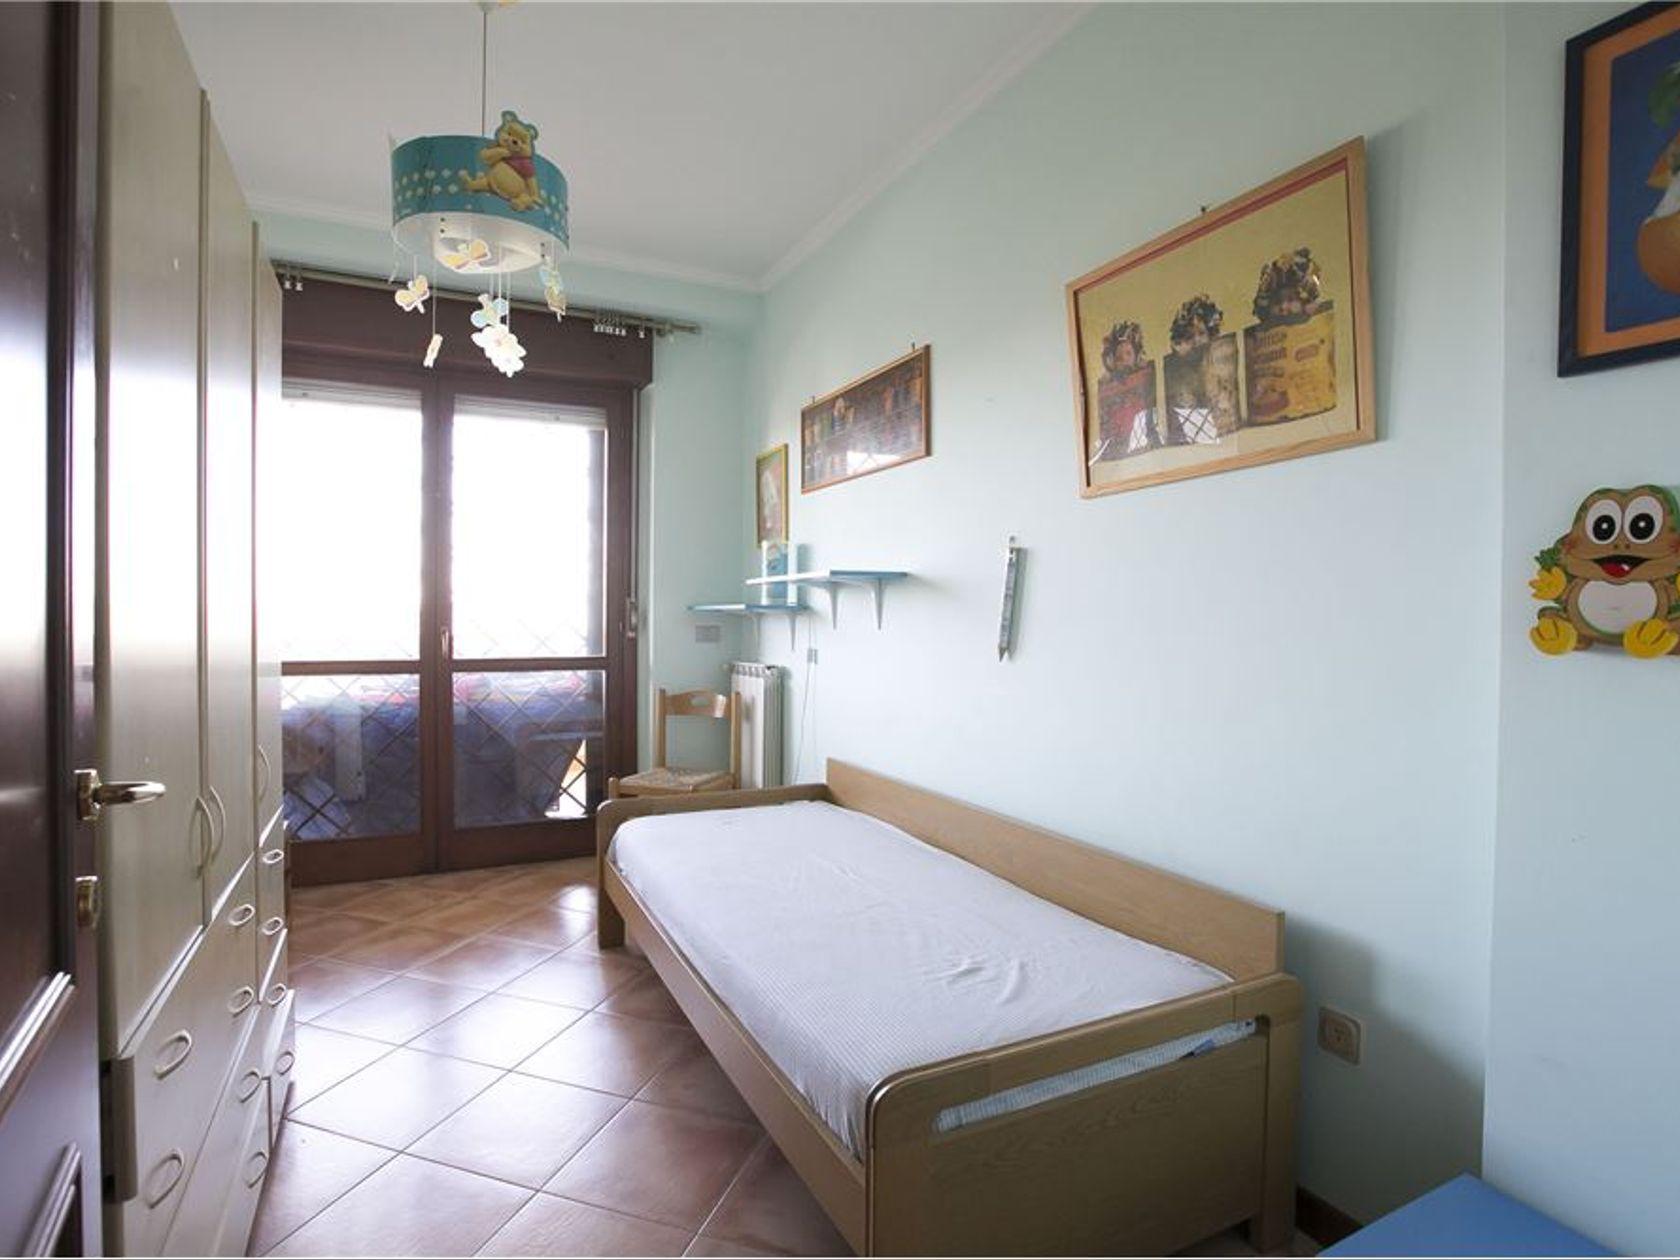 Appartamento Roma-acilia Vitinia Infernetto Axa Casal Palocco, Roma, RM Vendita - Foto 6